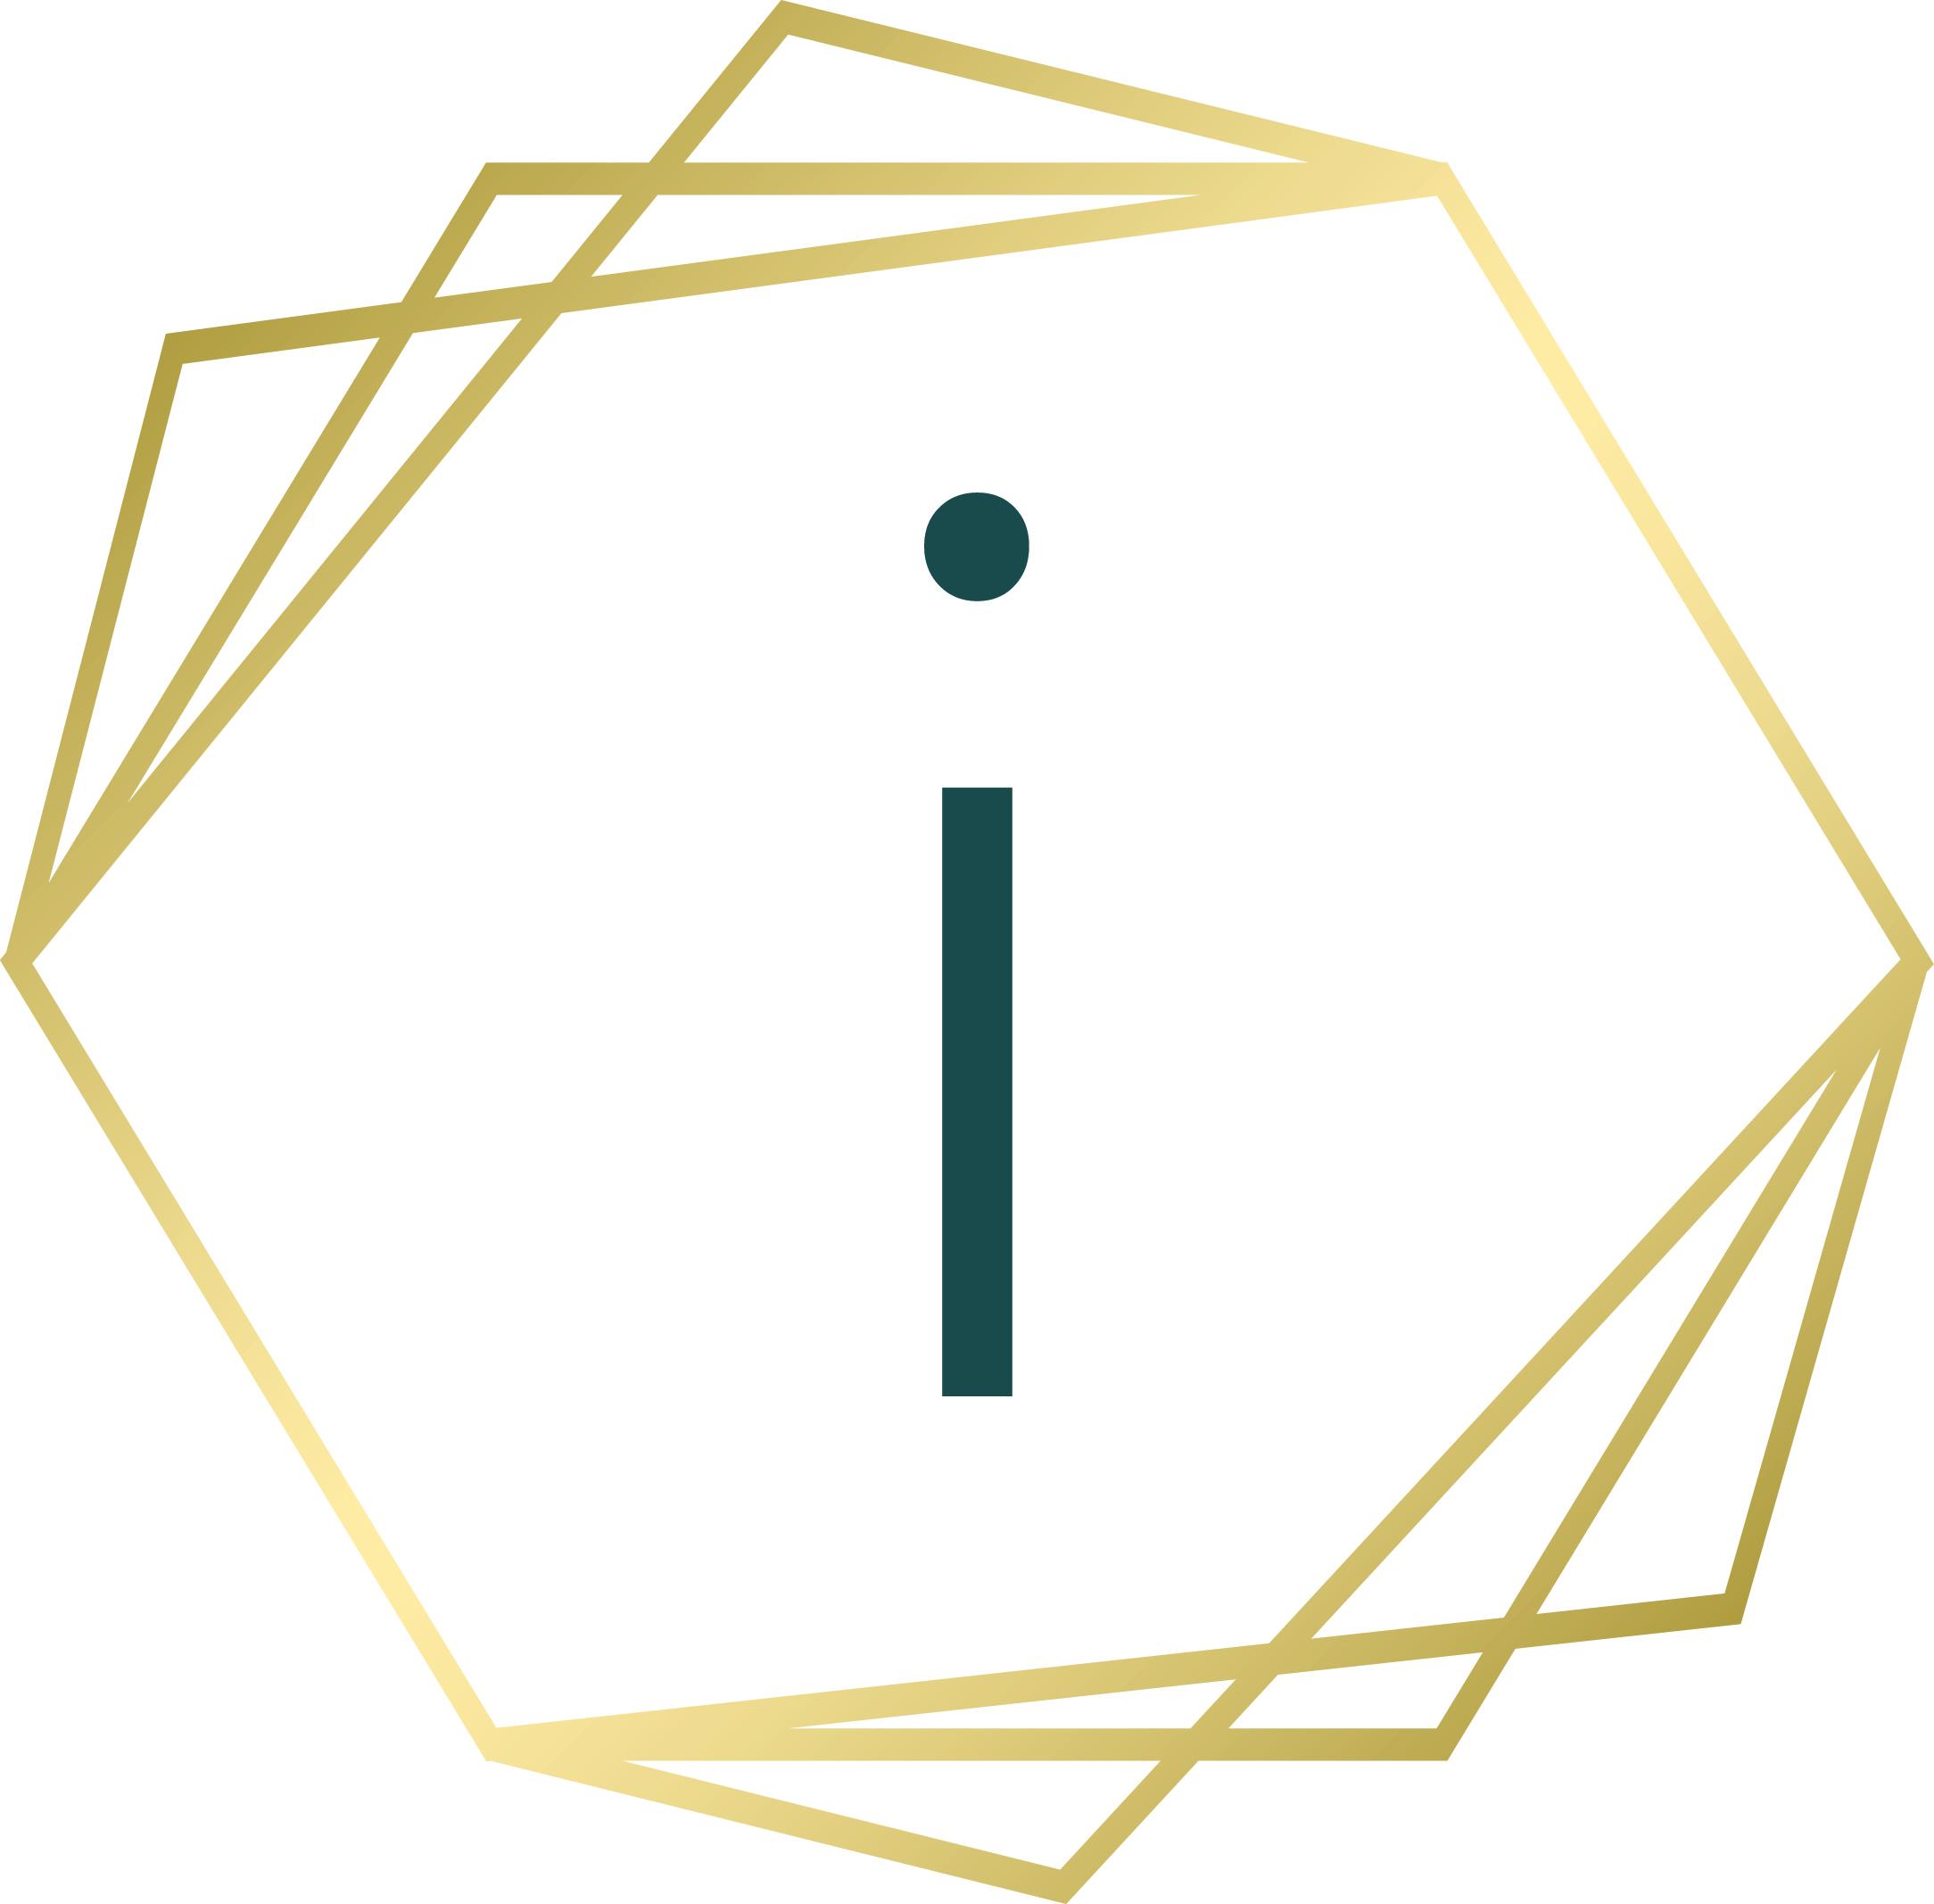 logo design, graphic design, branding